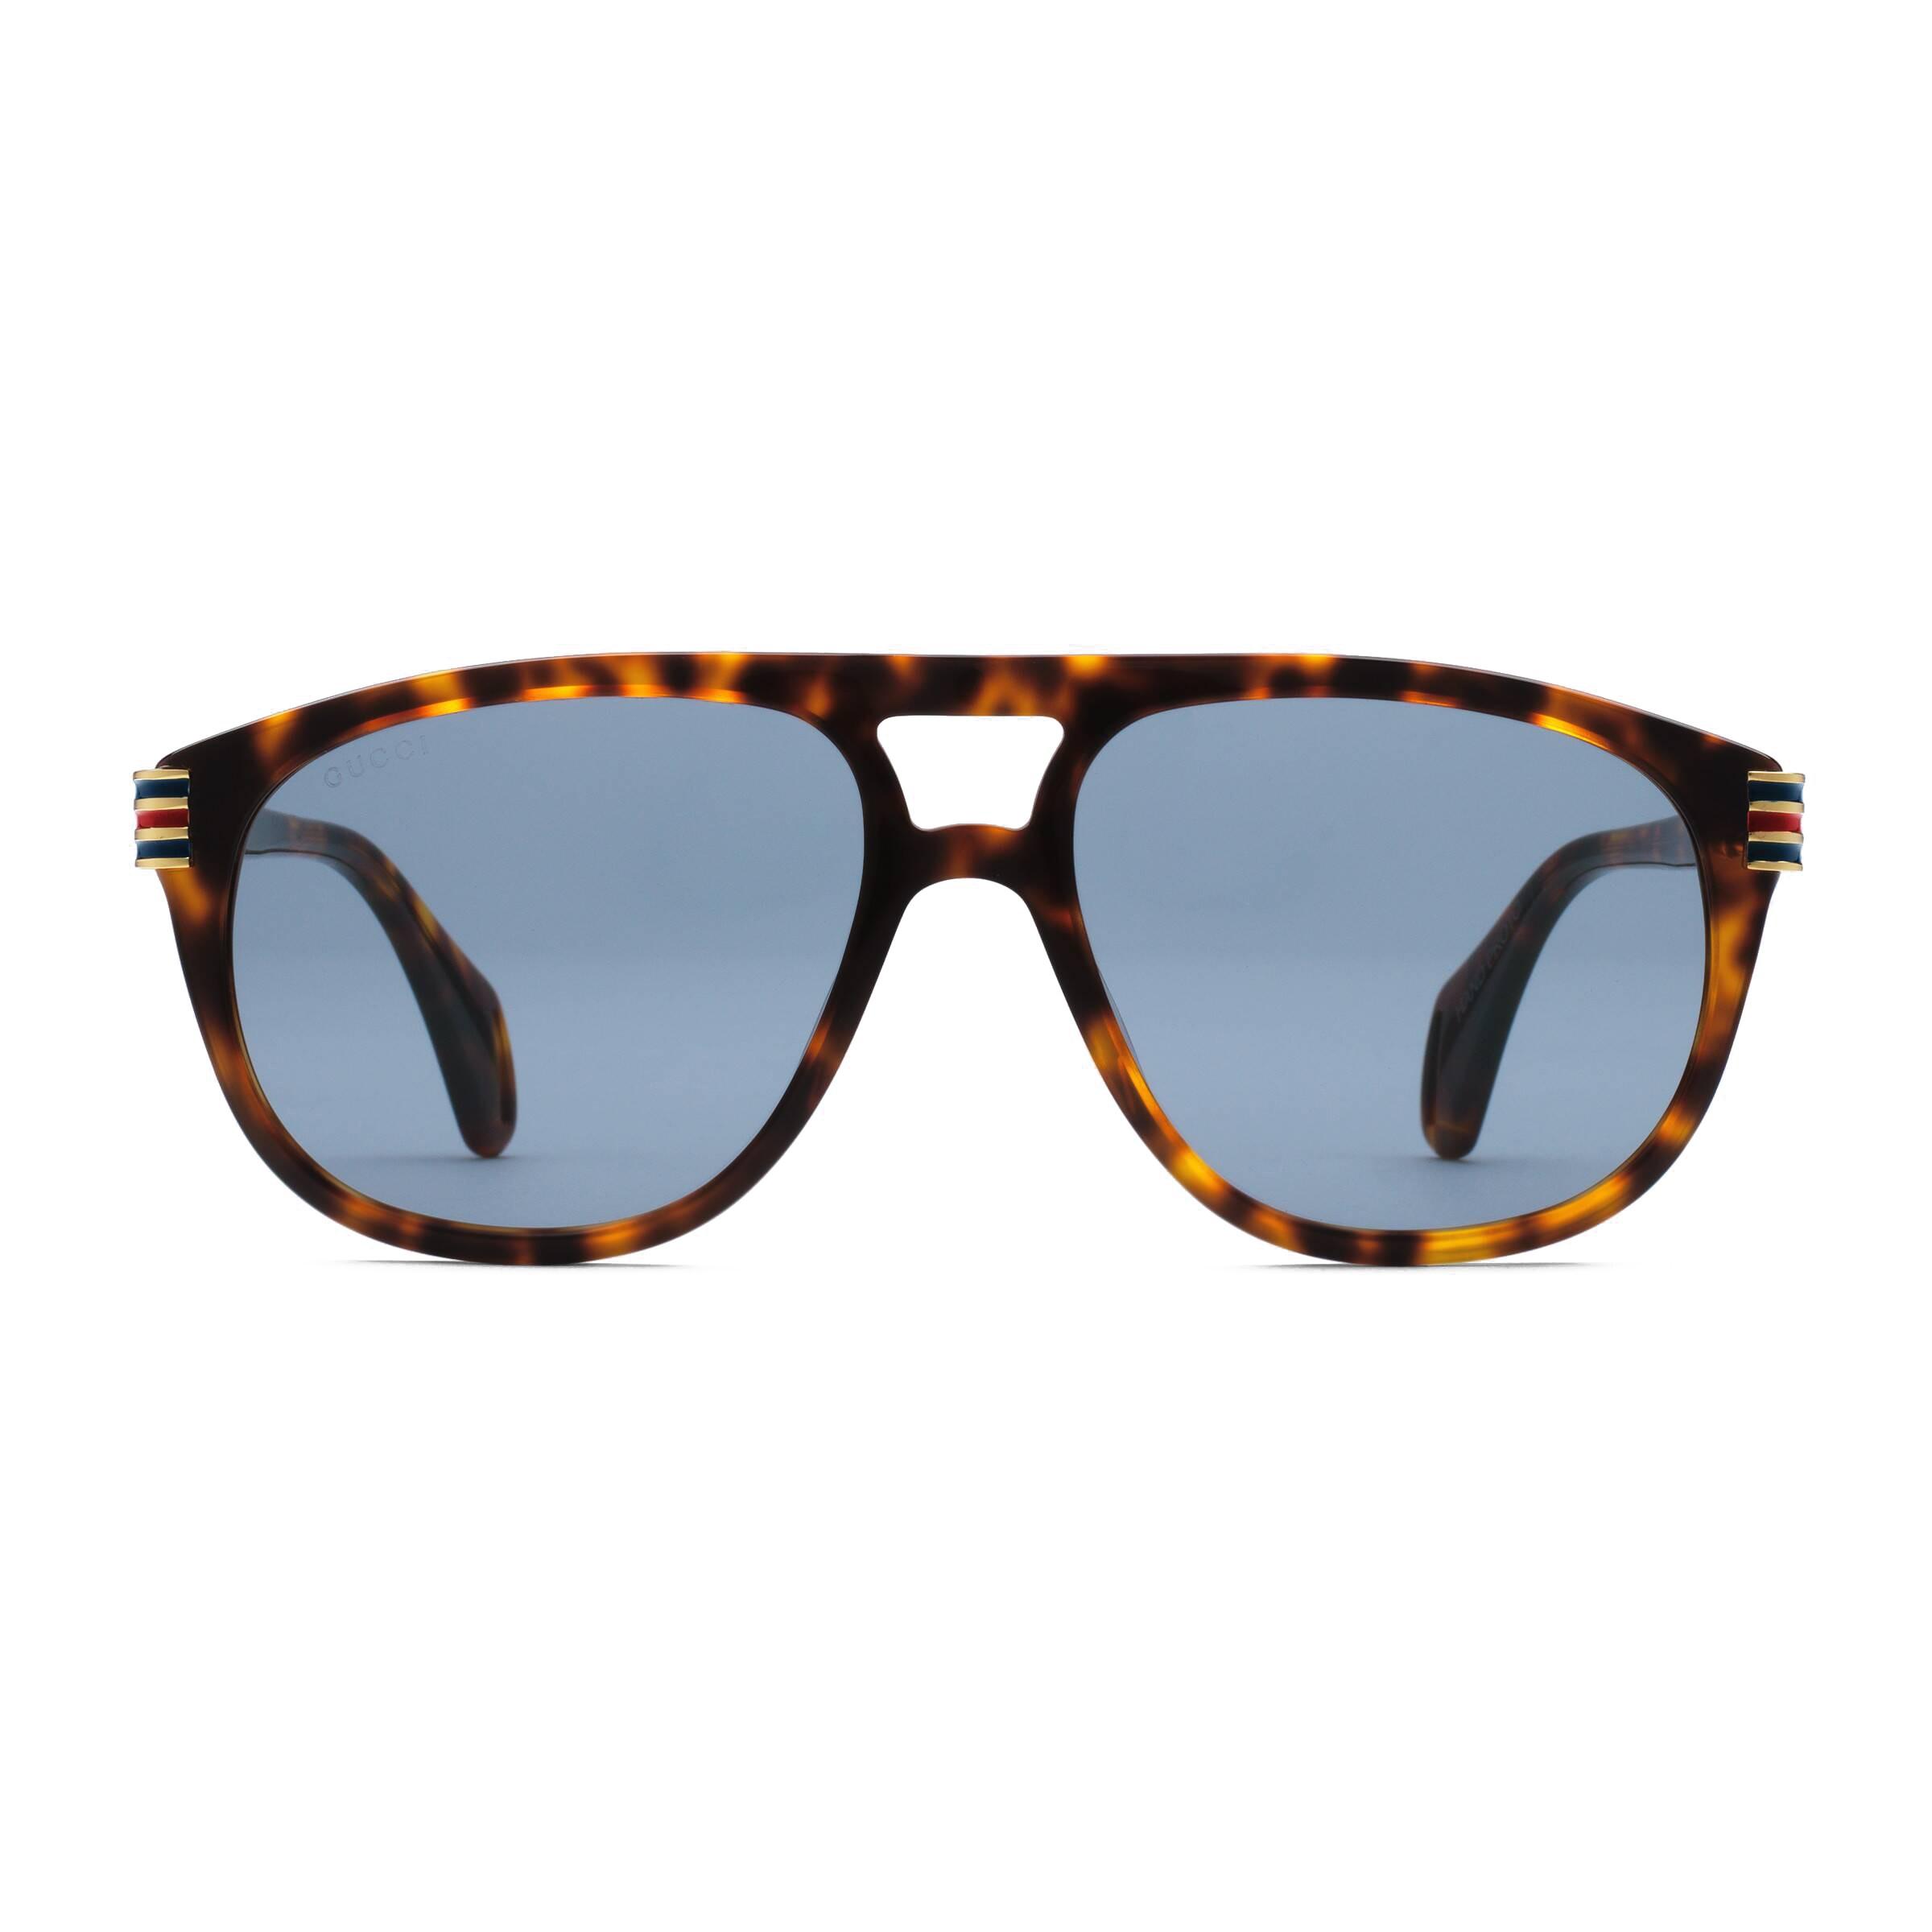 9028efaa8305 Gucci - Aviator Sunglassed with Web Enamel - Dark Turtle - Gucci Eyewear -  Avvenice